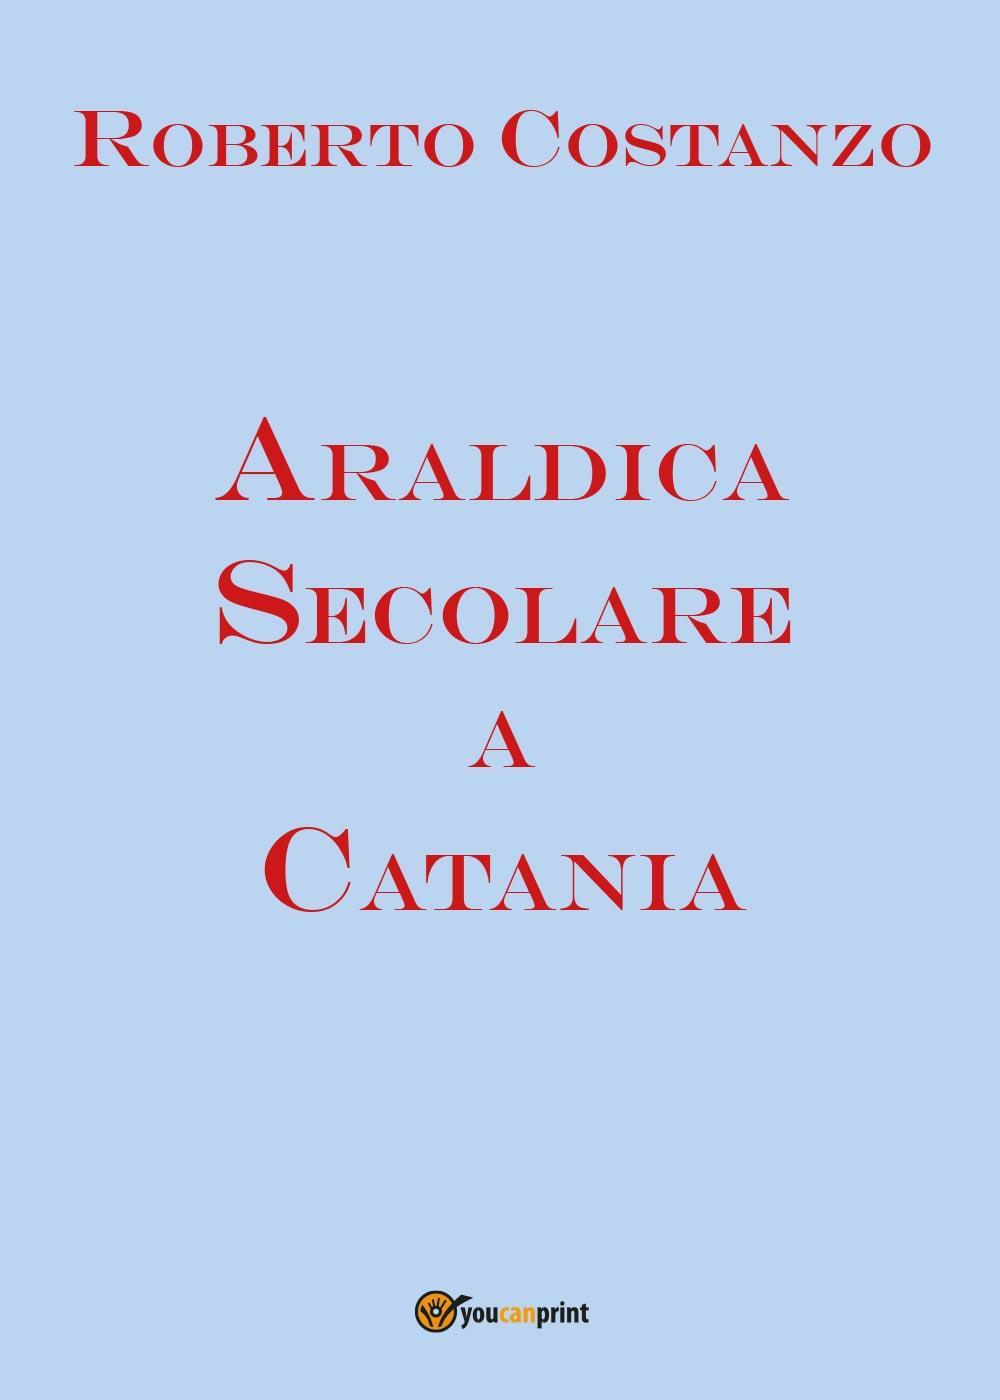 Araldica Secolare a Catania